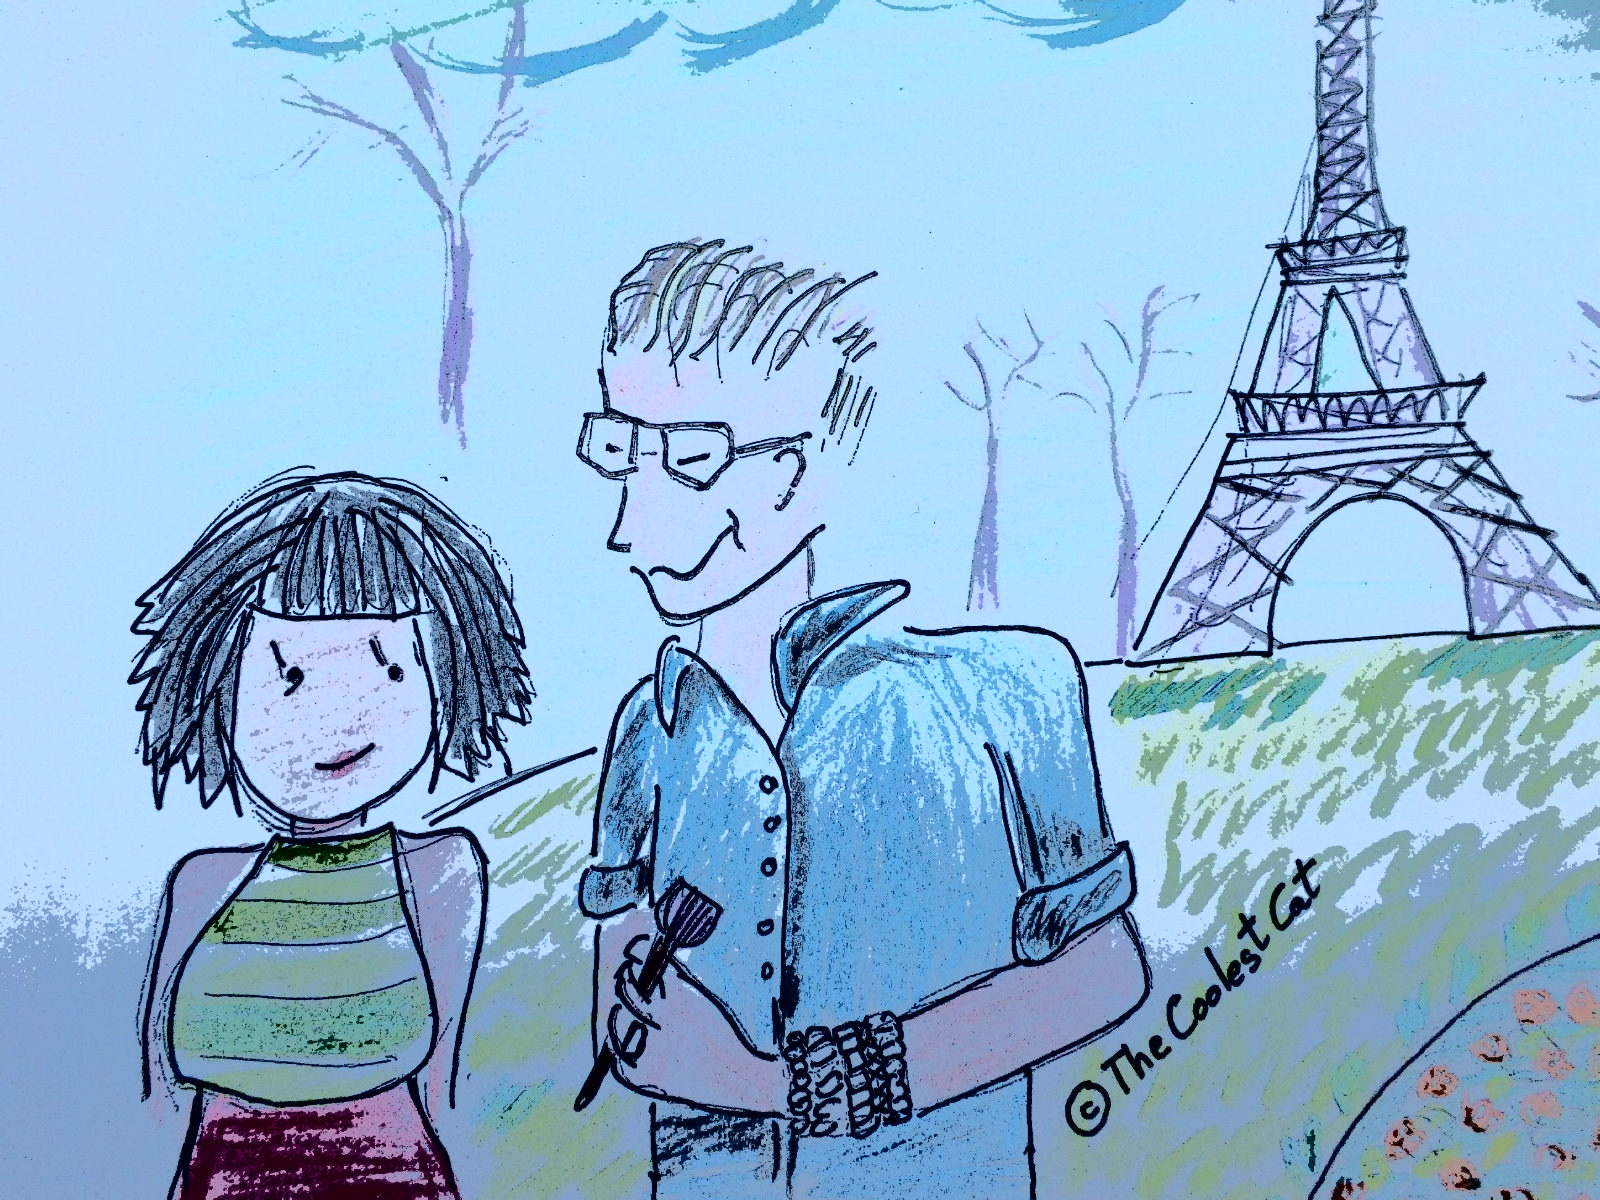 El día que le pedí a Eduardo Ferreira de Bobbi Brown que viniera conmigo a París...